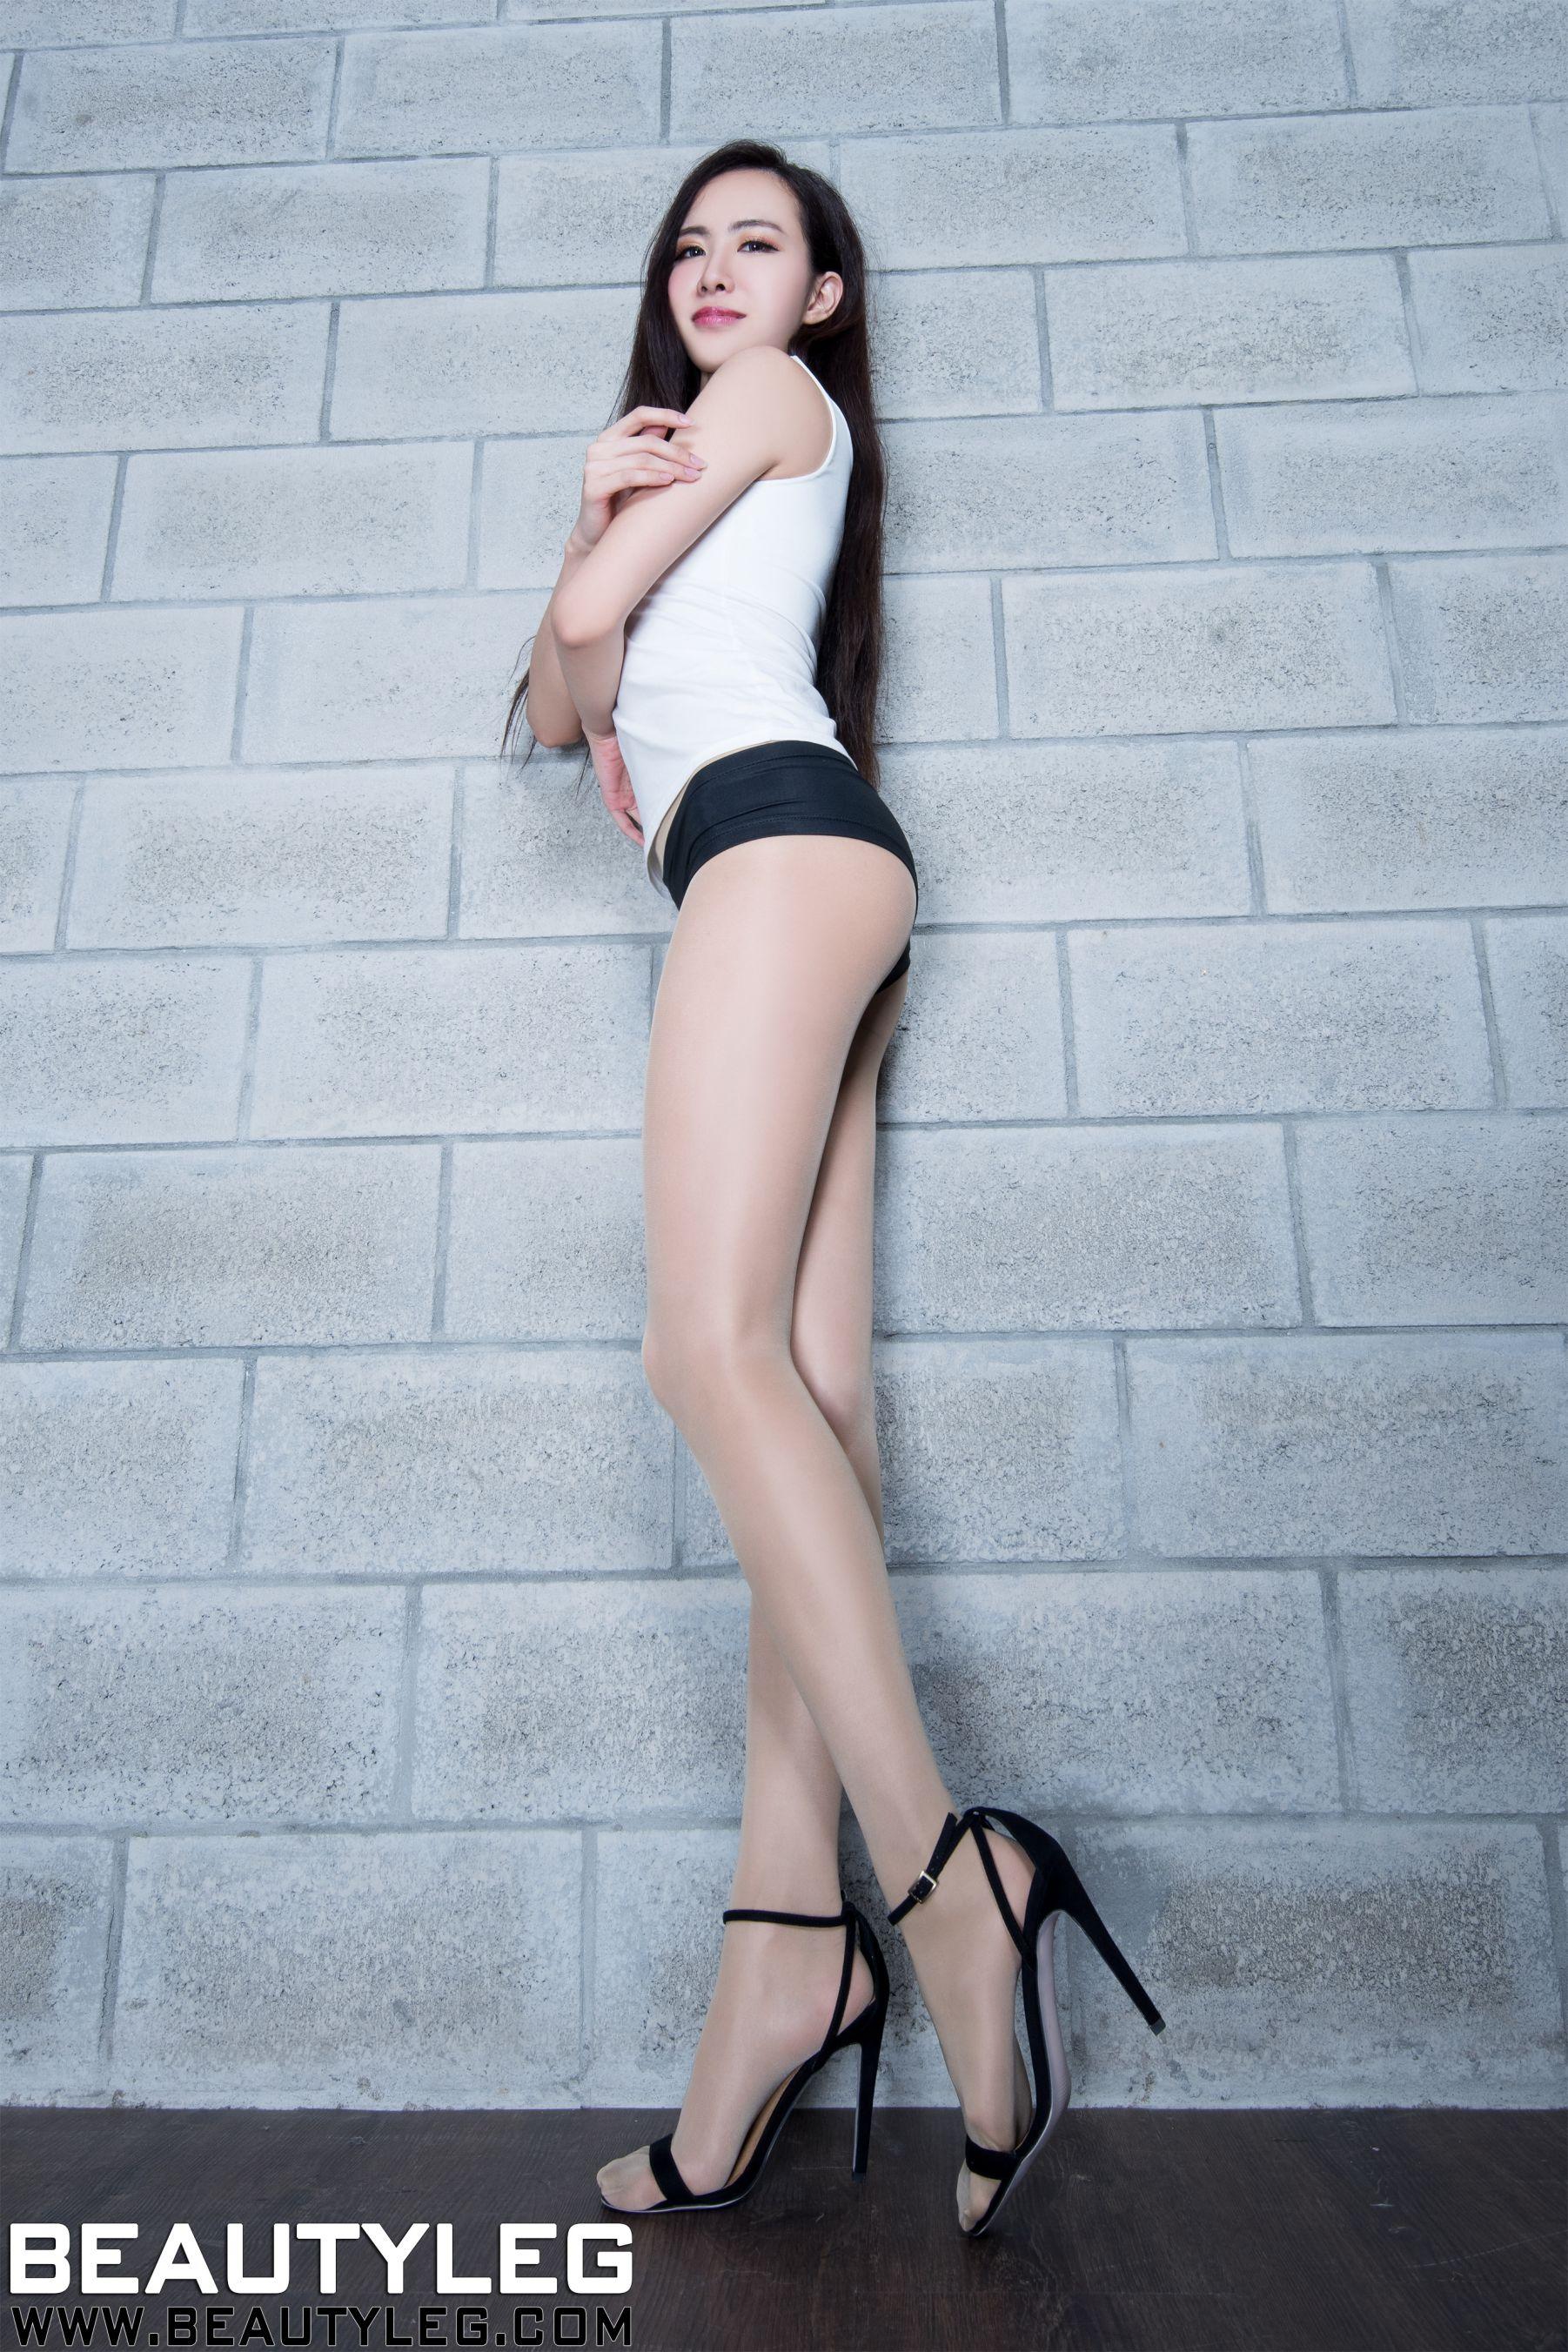 VOL.1859 [Beautyleg]美腿:曾妍希(腿模Dora)高品质写真套图(52P)